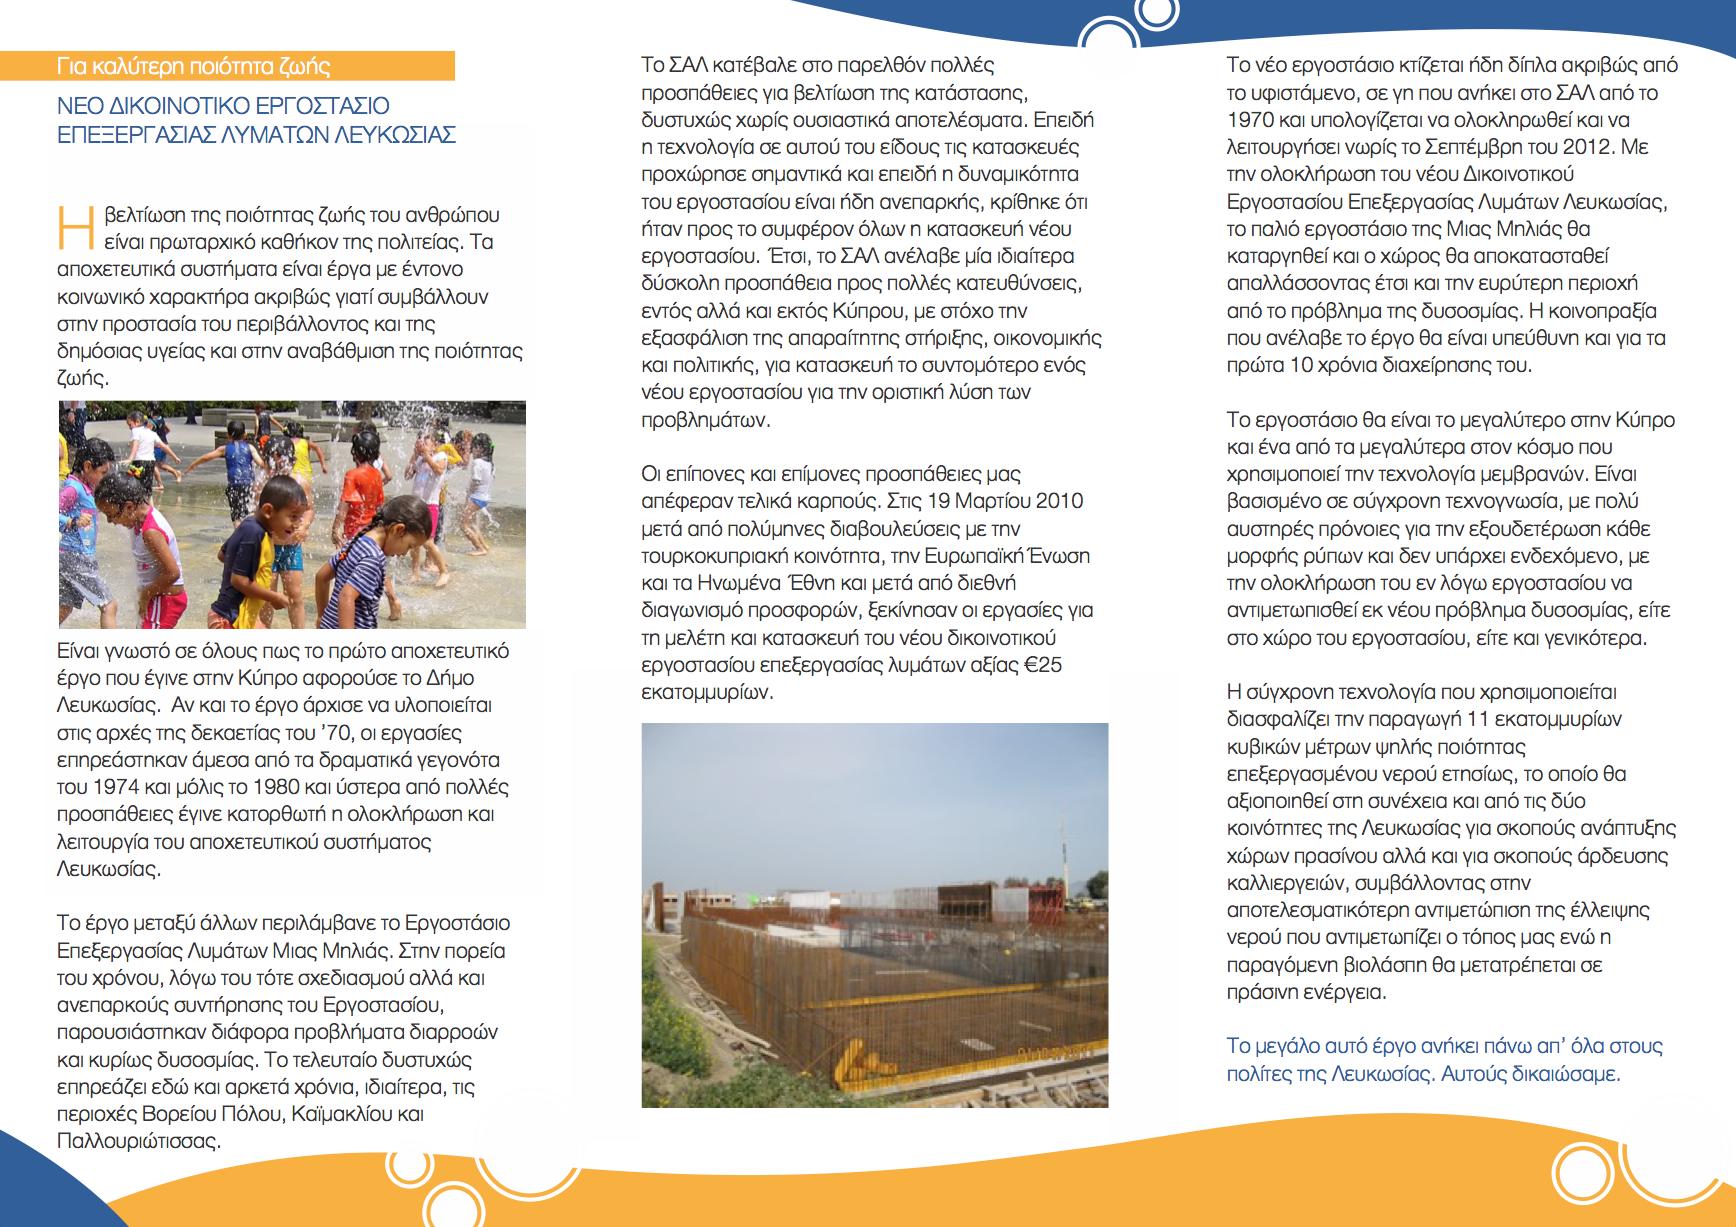 Sewerage Board Nicosia Leaflet